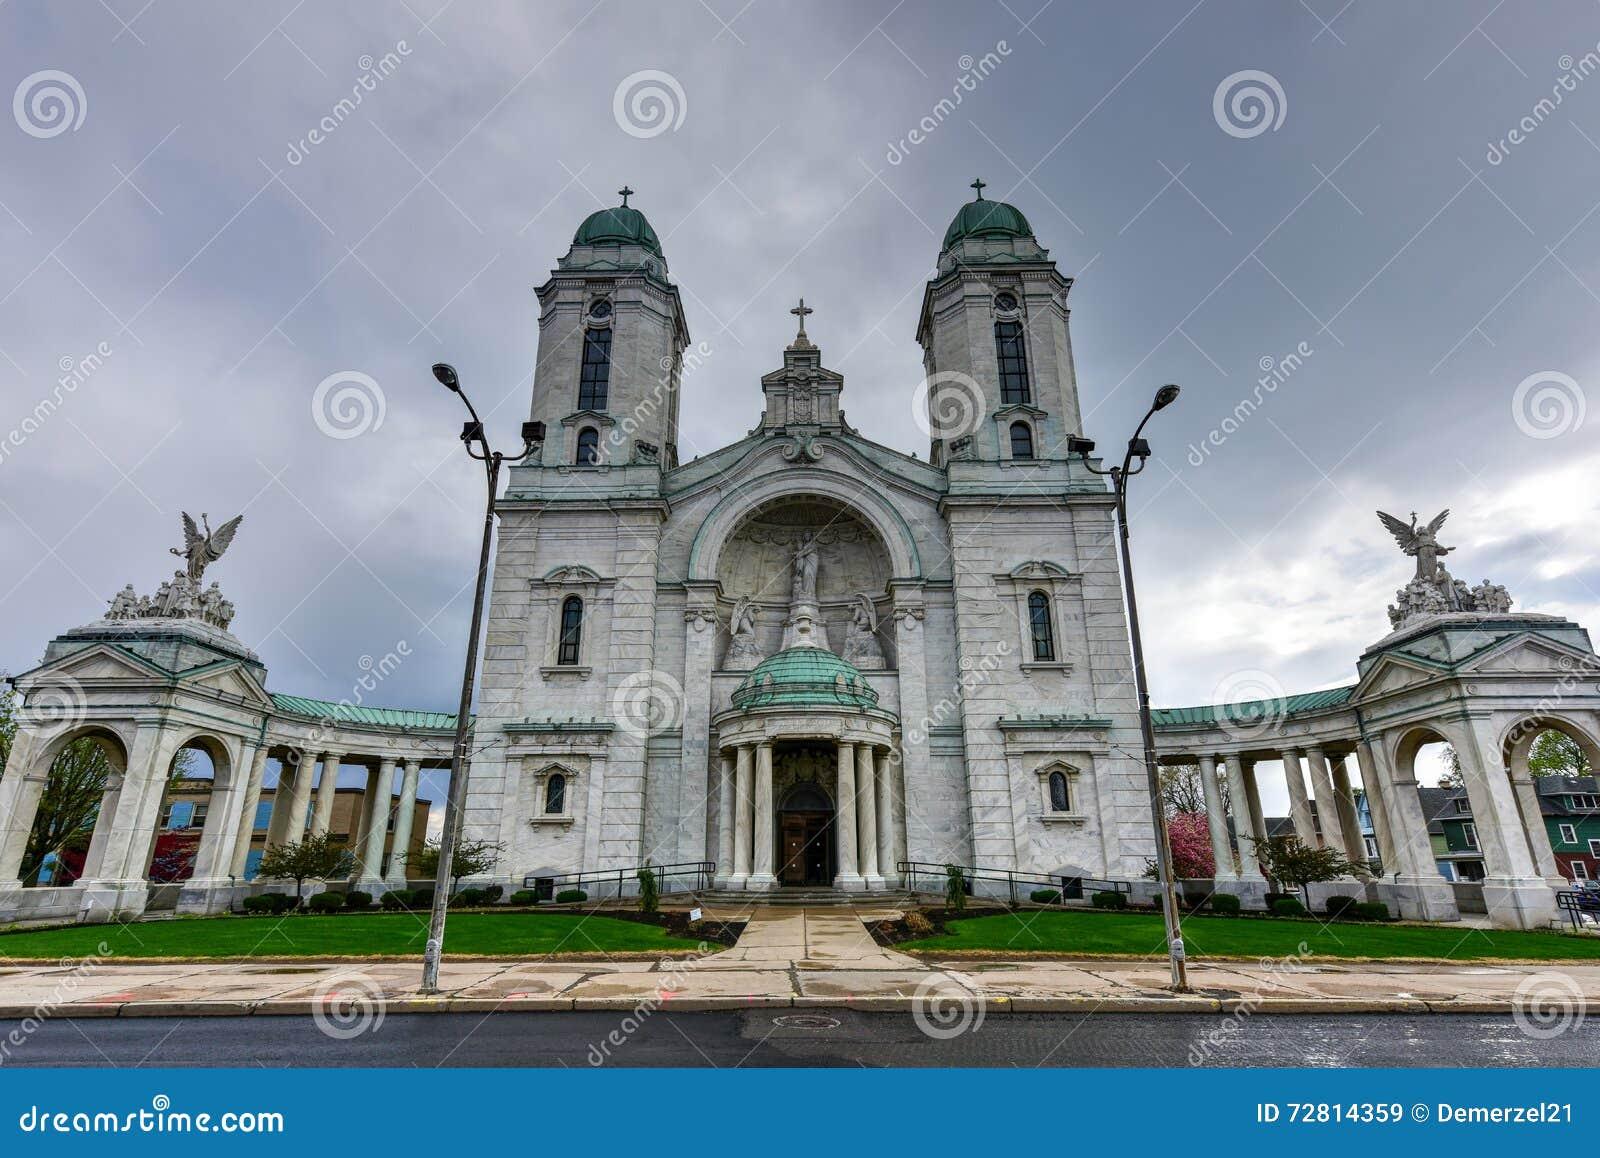 Nossa senhora de Victory Basilica - Lackawanna, NY